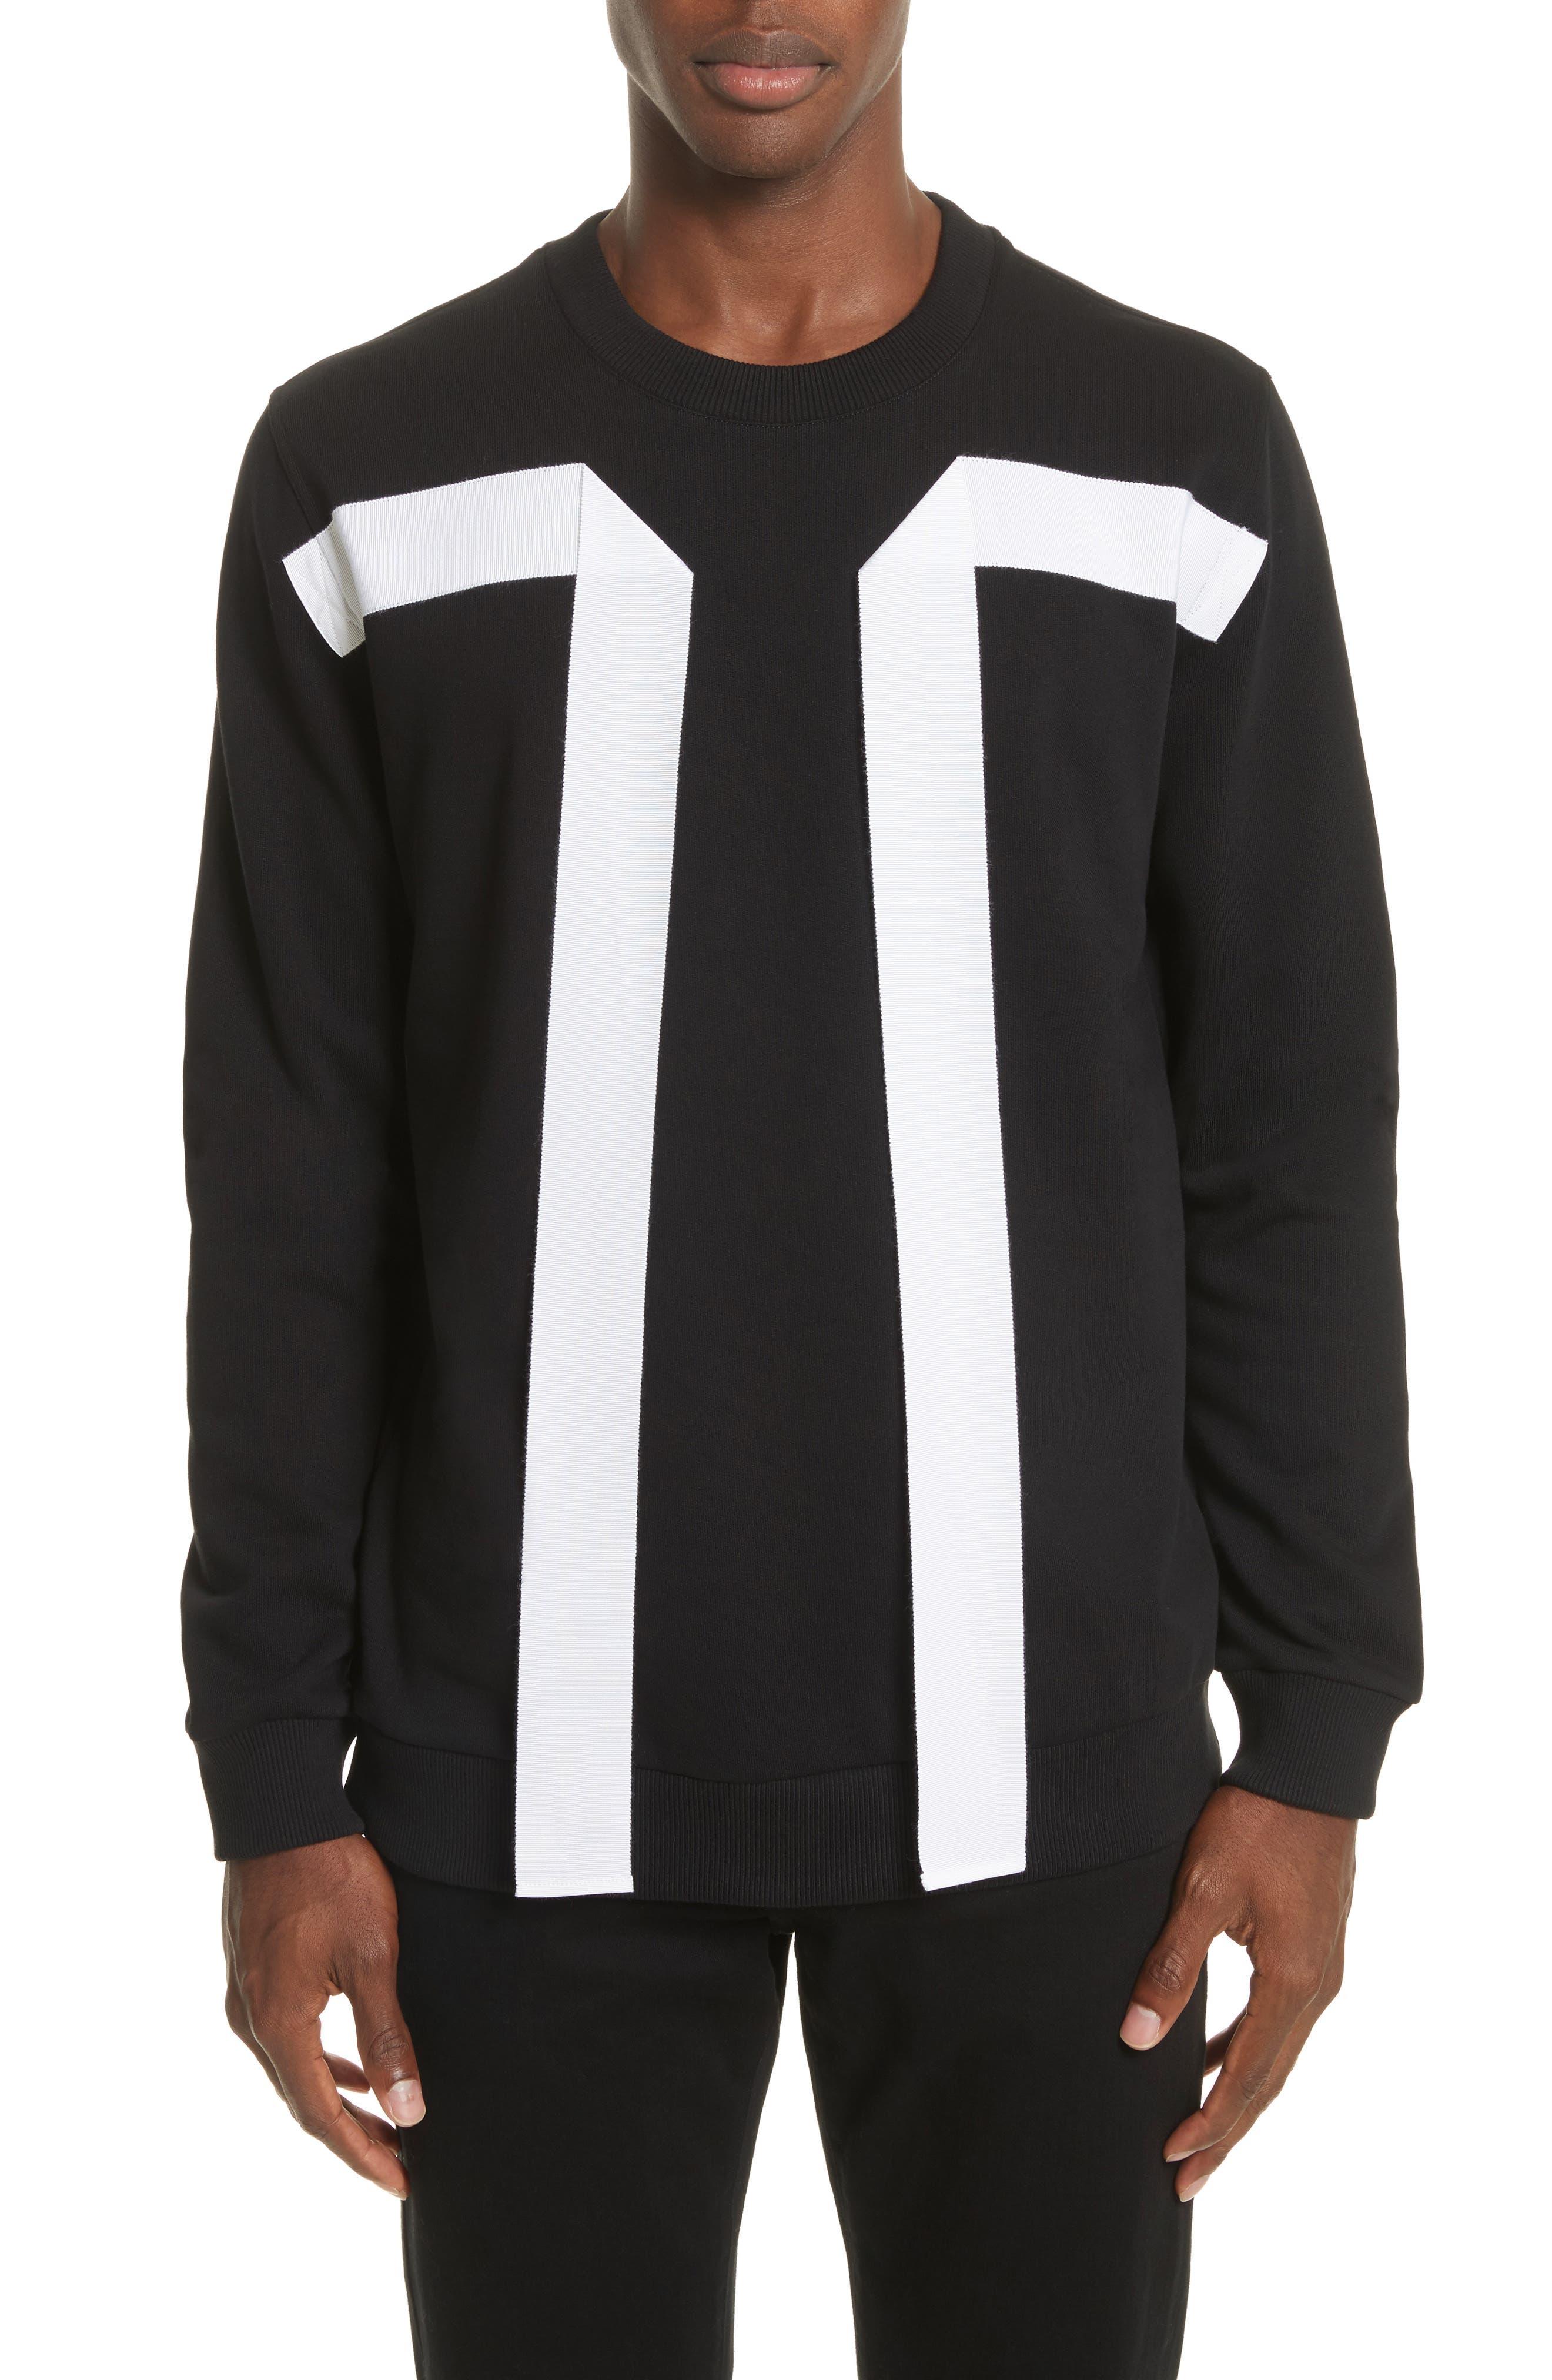 Alternate Image 1 Selected - Givenchy Flying Bands Crewneck Sweatshirt